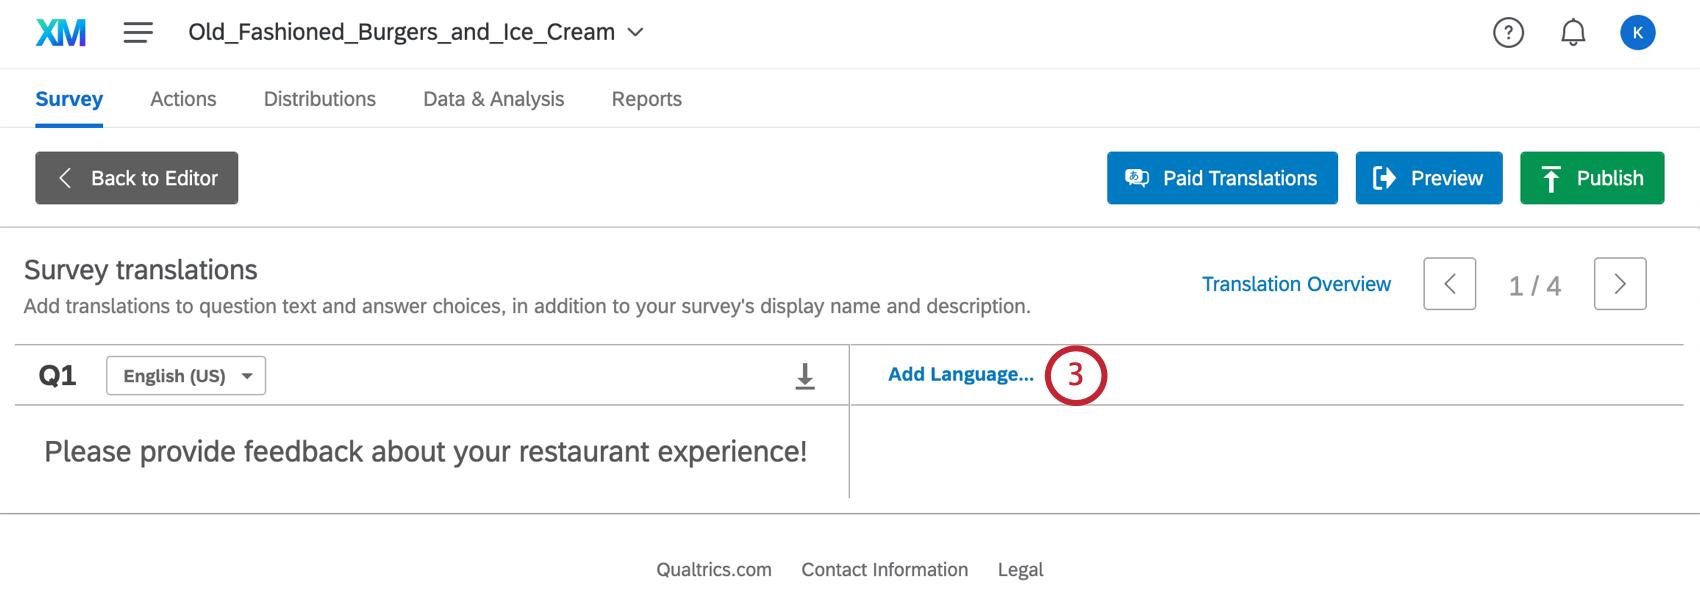 Add Language button